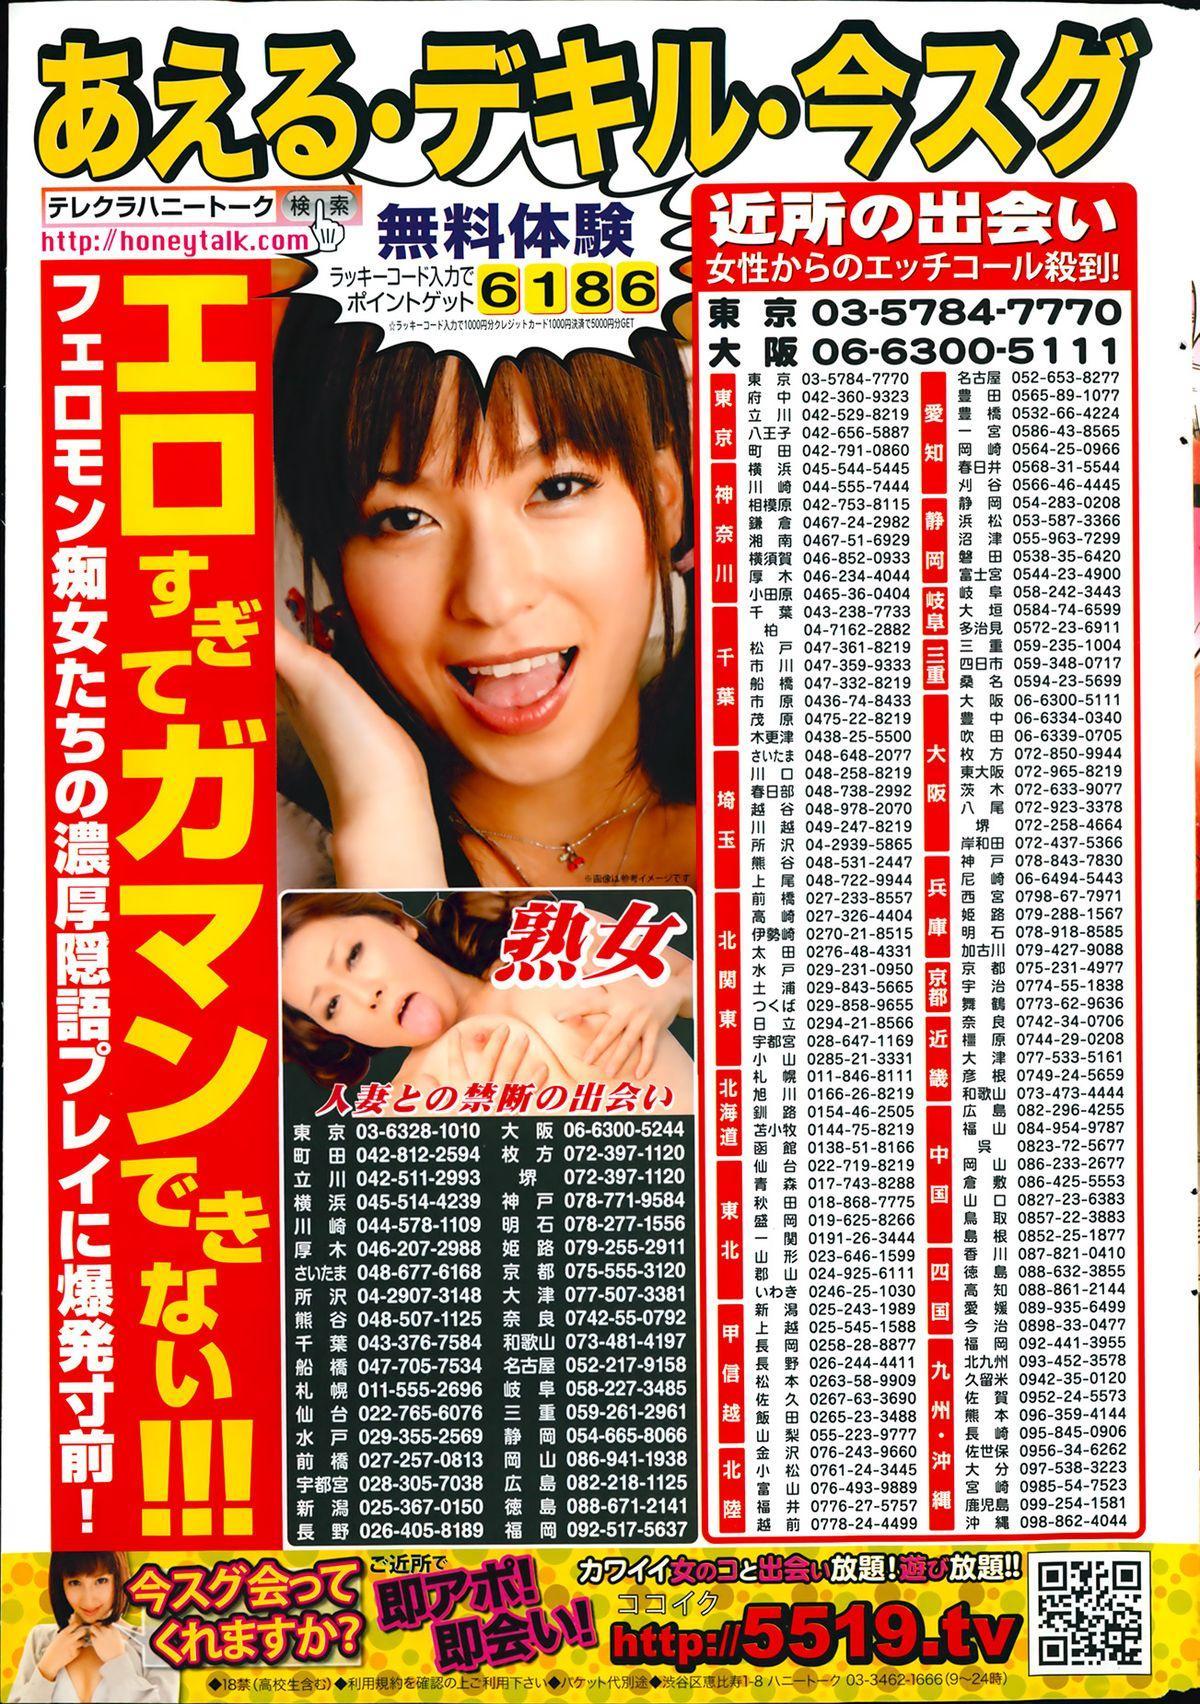 COMIC SIGMA 2014-03 Vol.78 275